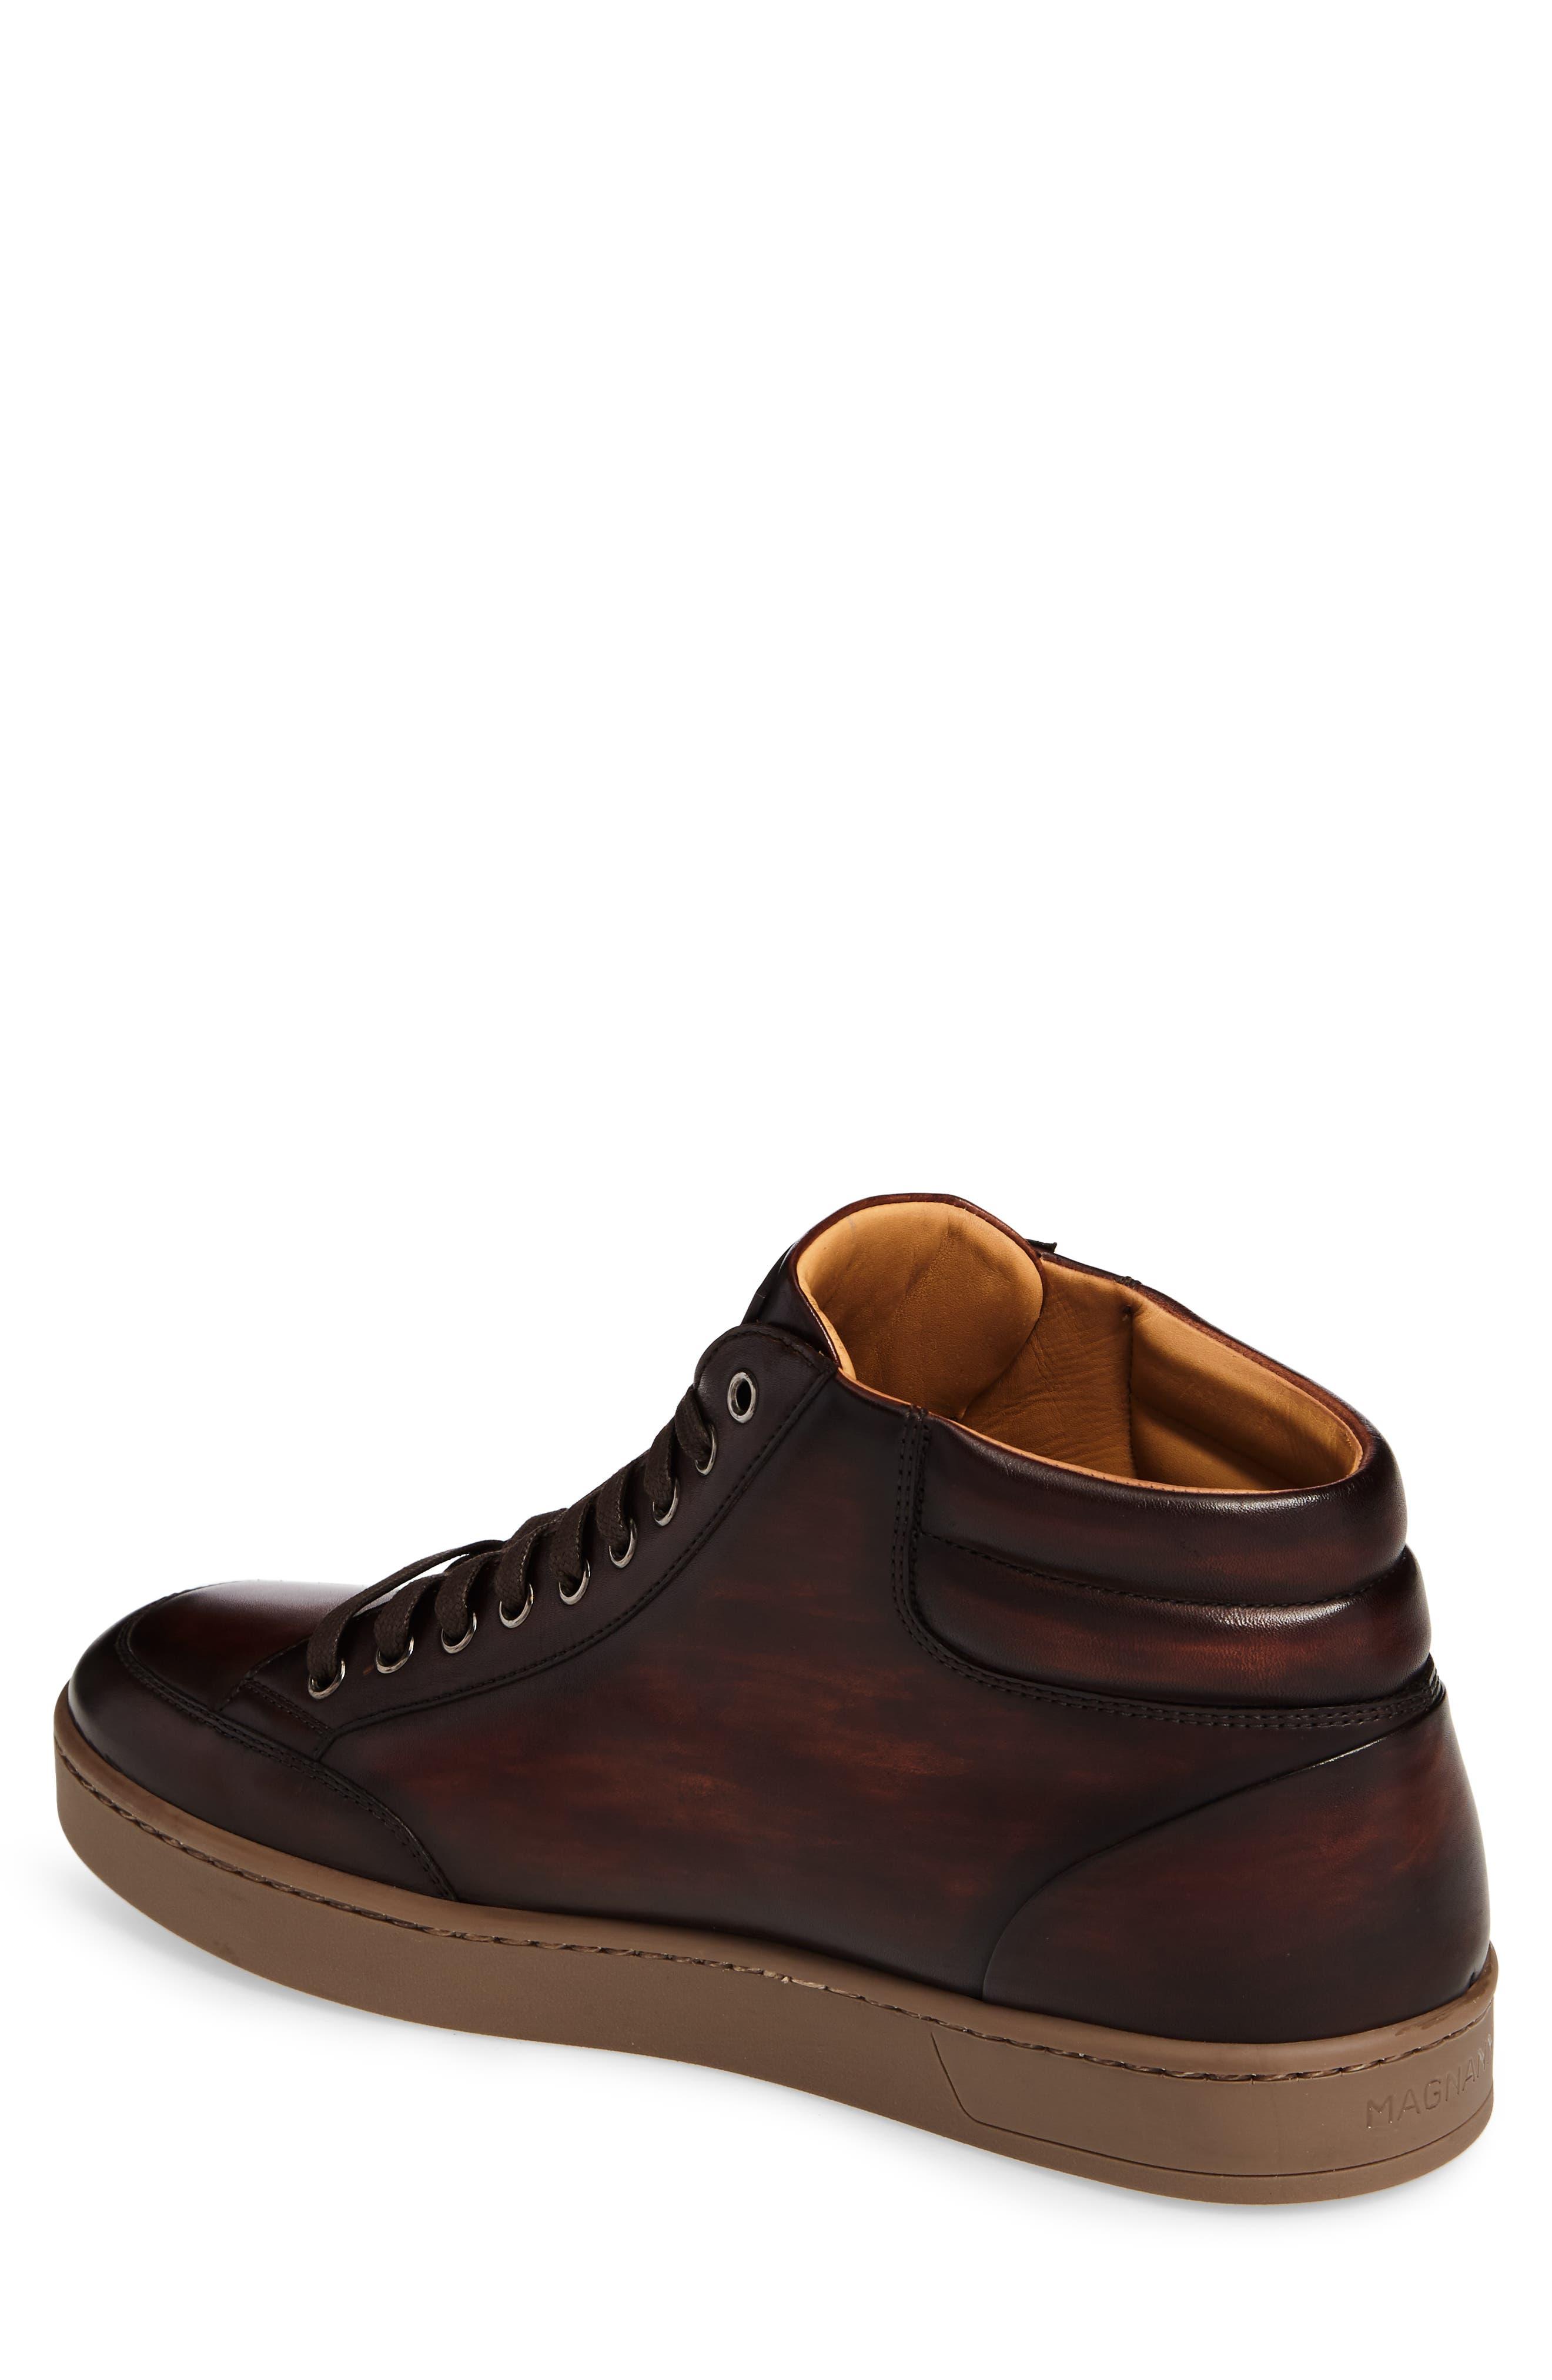 Carmel Sneaker,                             Alternate thumbnail 2, color,                             Mid Brown Leather